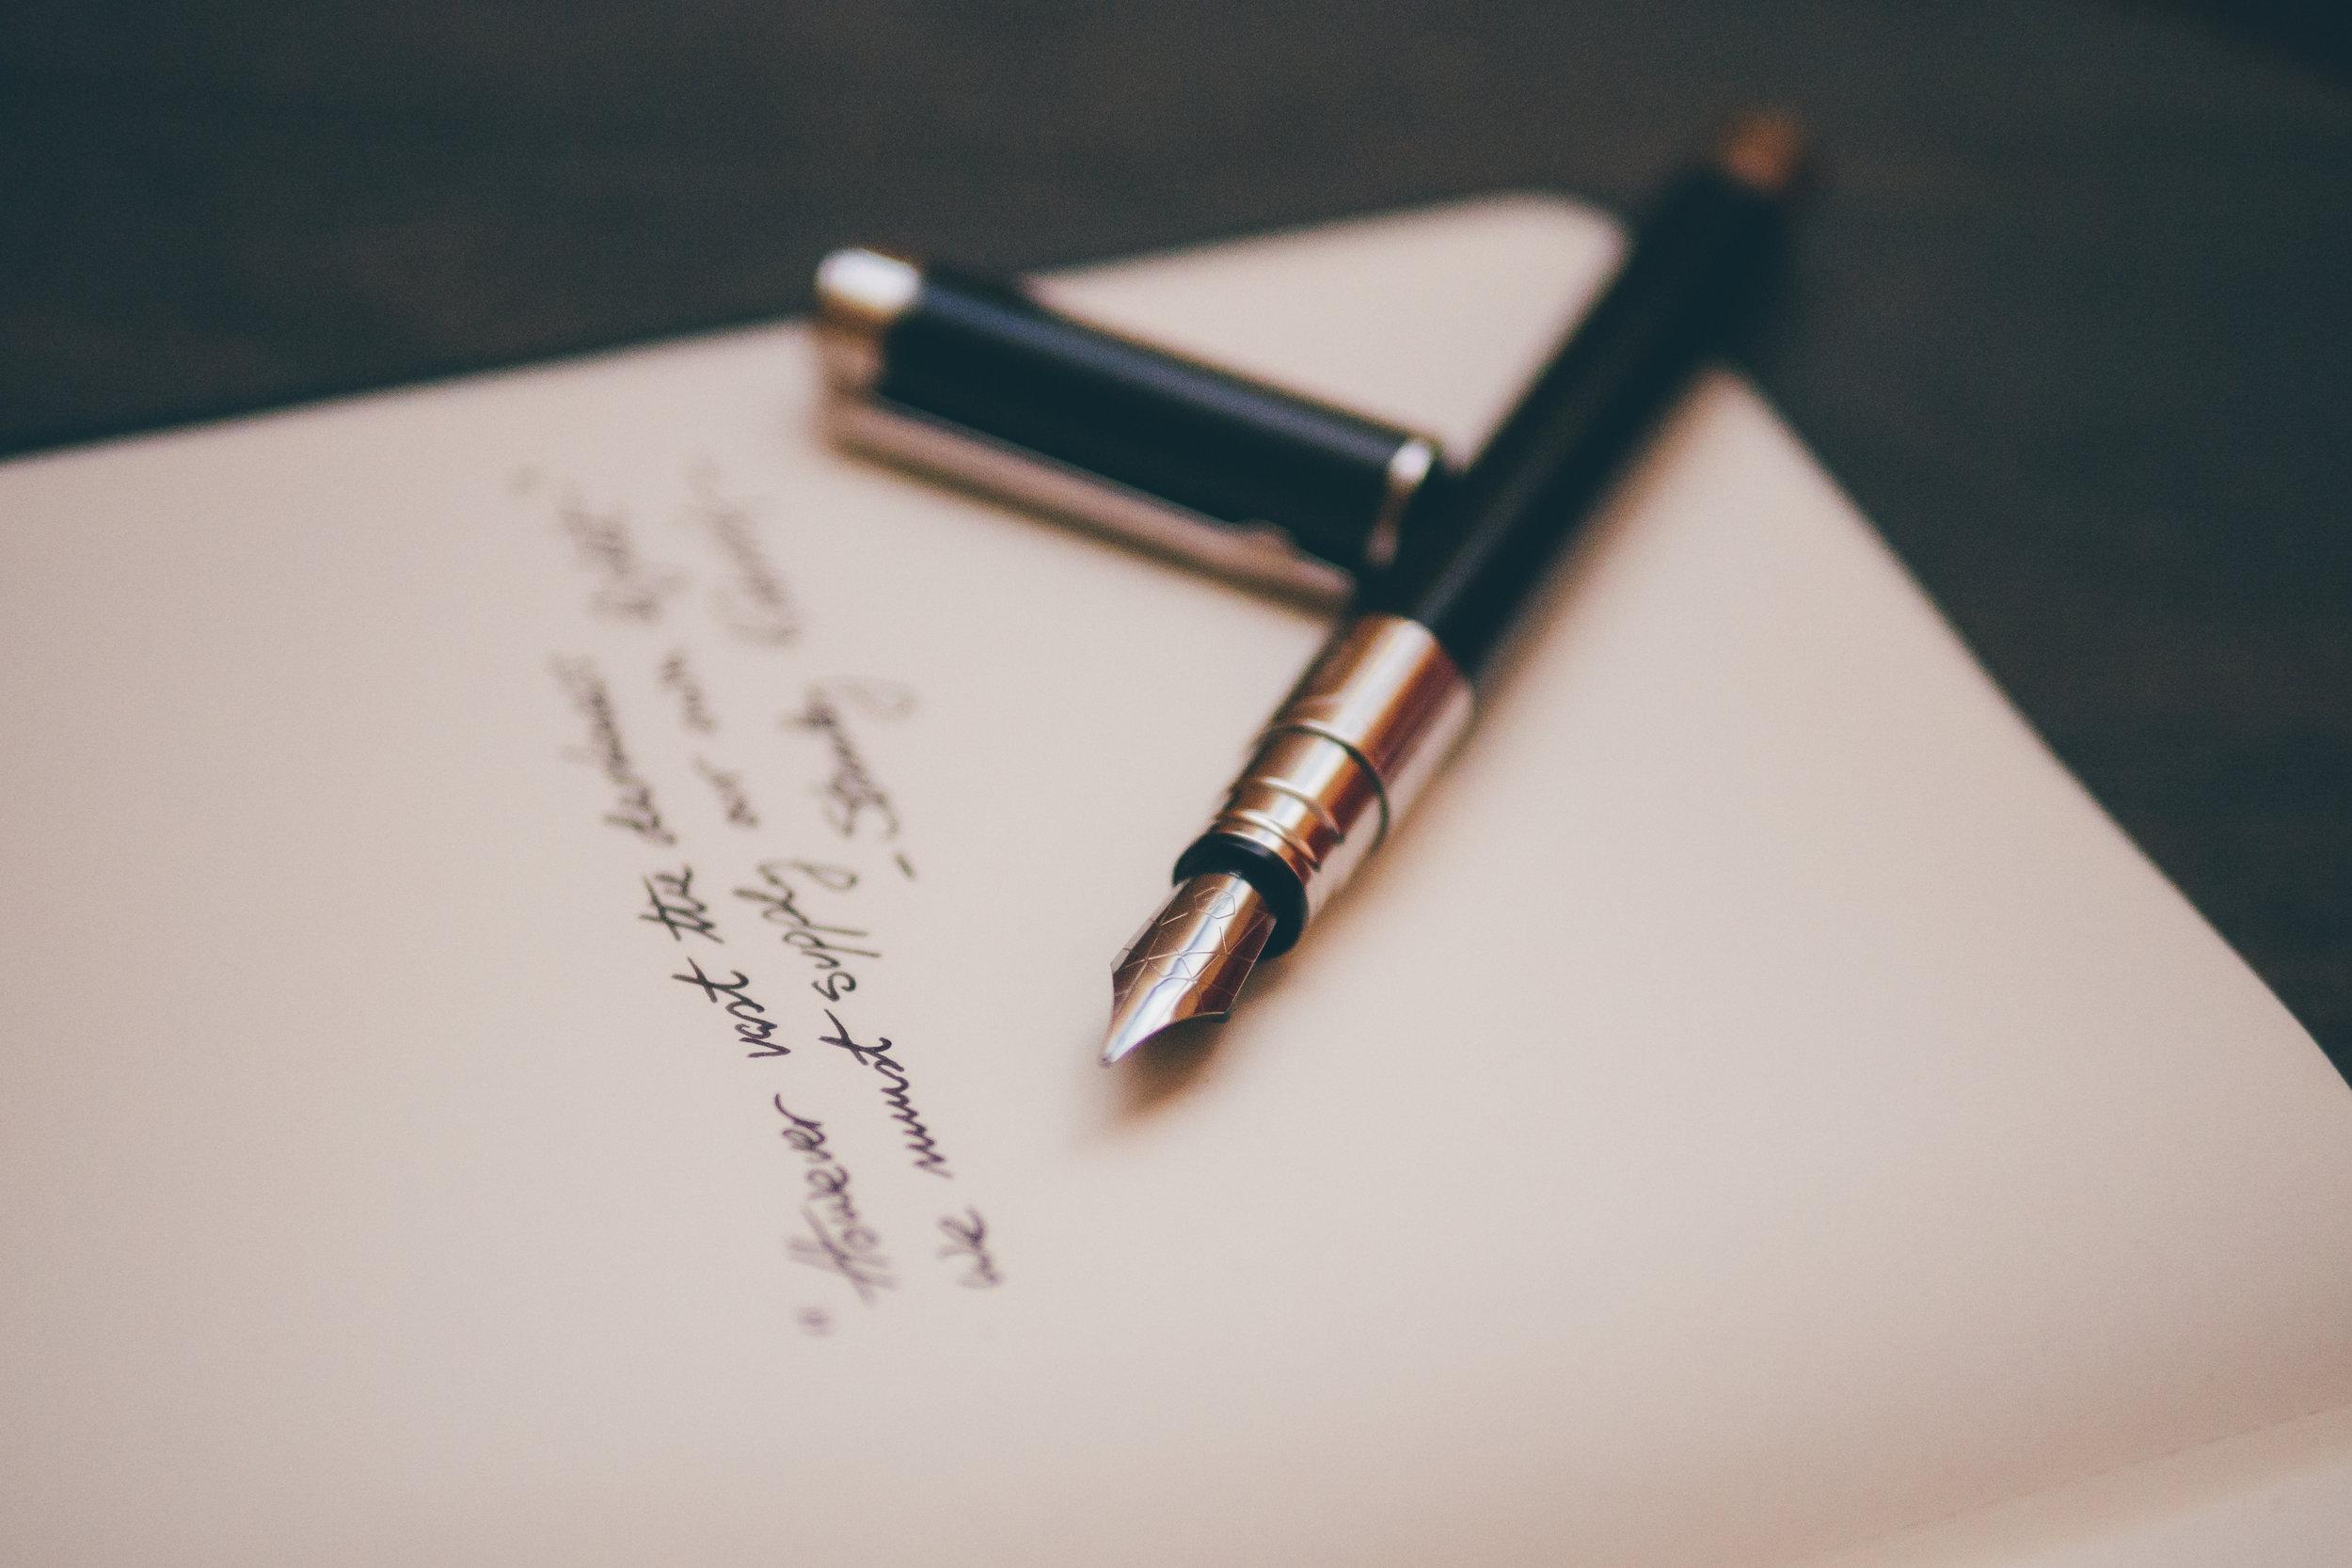 Copy of writing-fountain-pen-unsplash-alvaro-serrano-133360.jpg